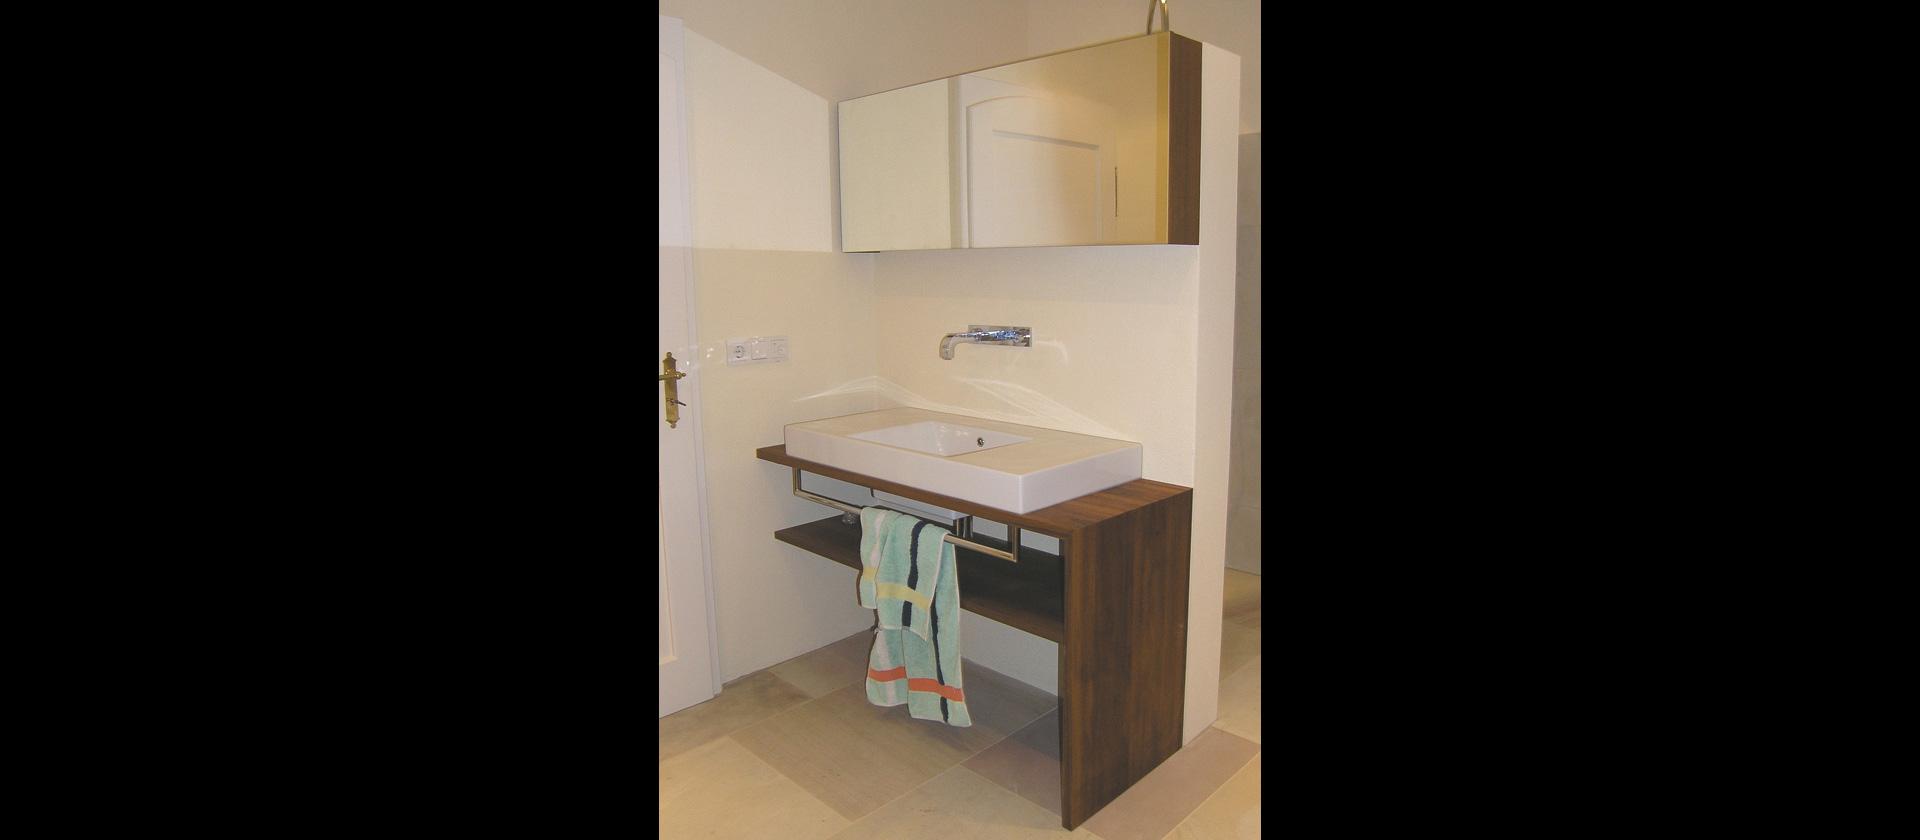 MTB-Badmöbel in Teak | Einbaumöbel , Badezimmermöbel